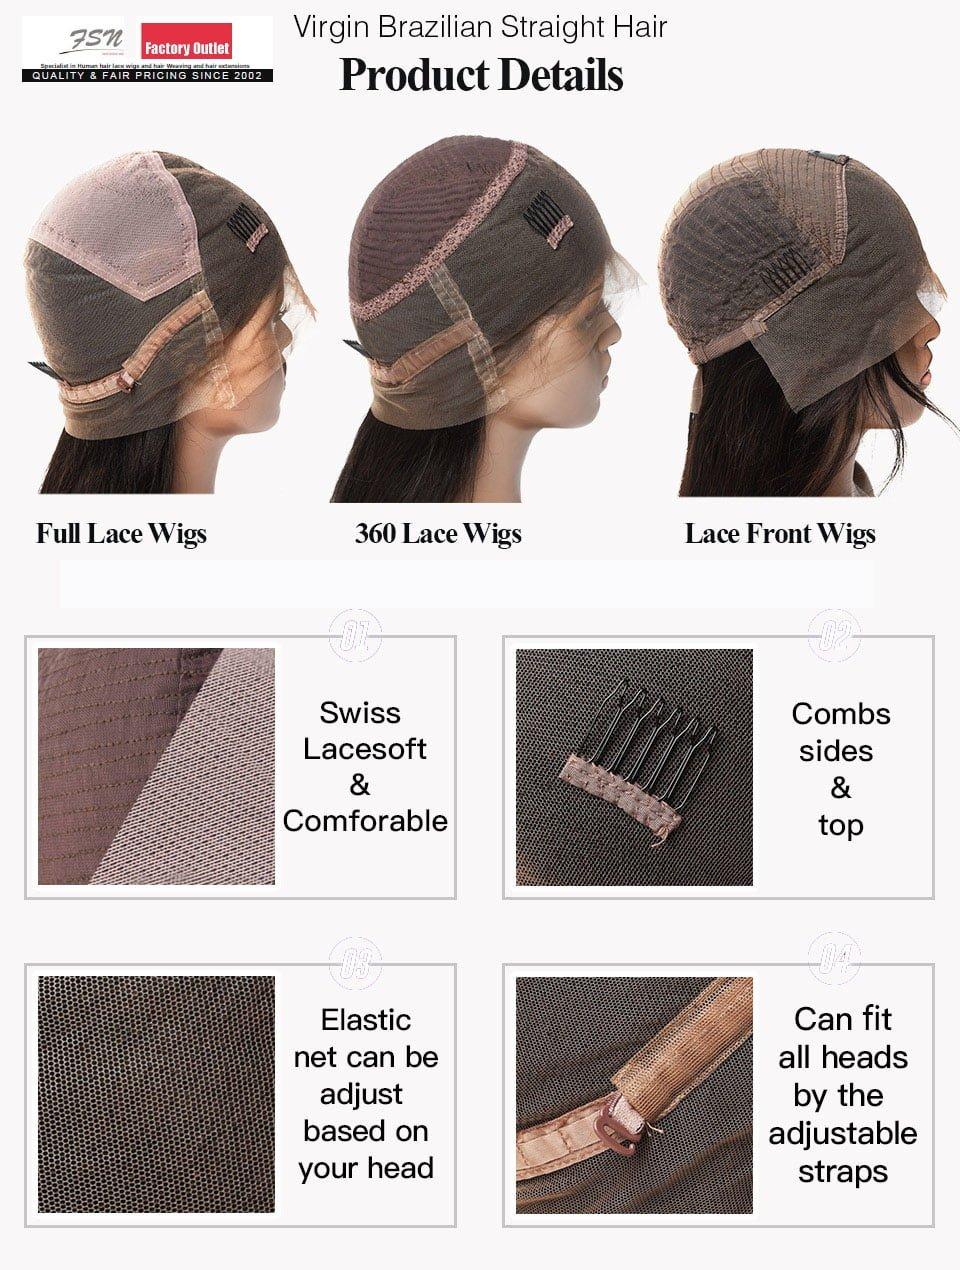 Brazilian Virgin Hair Straight Full Lace Wigs cap style